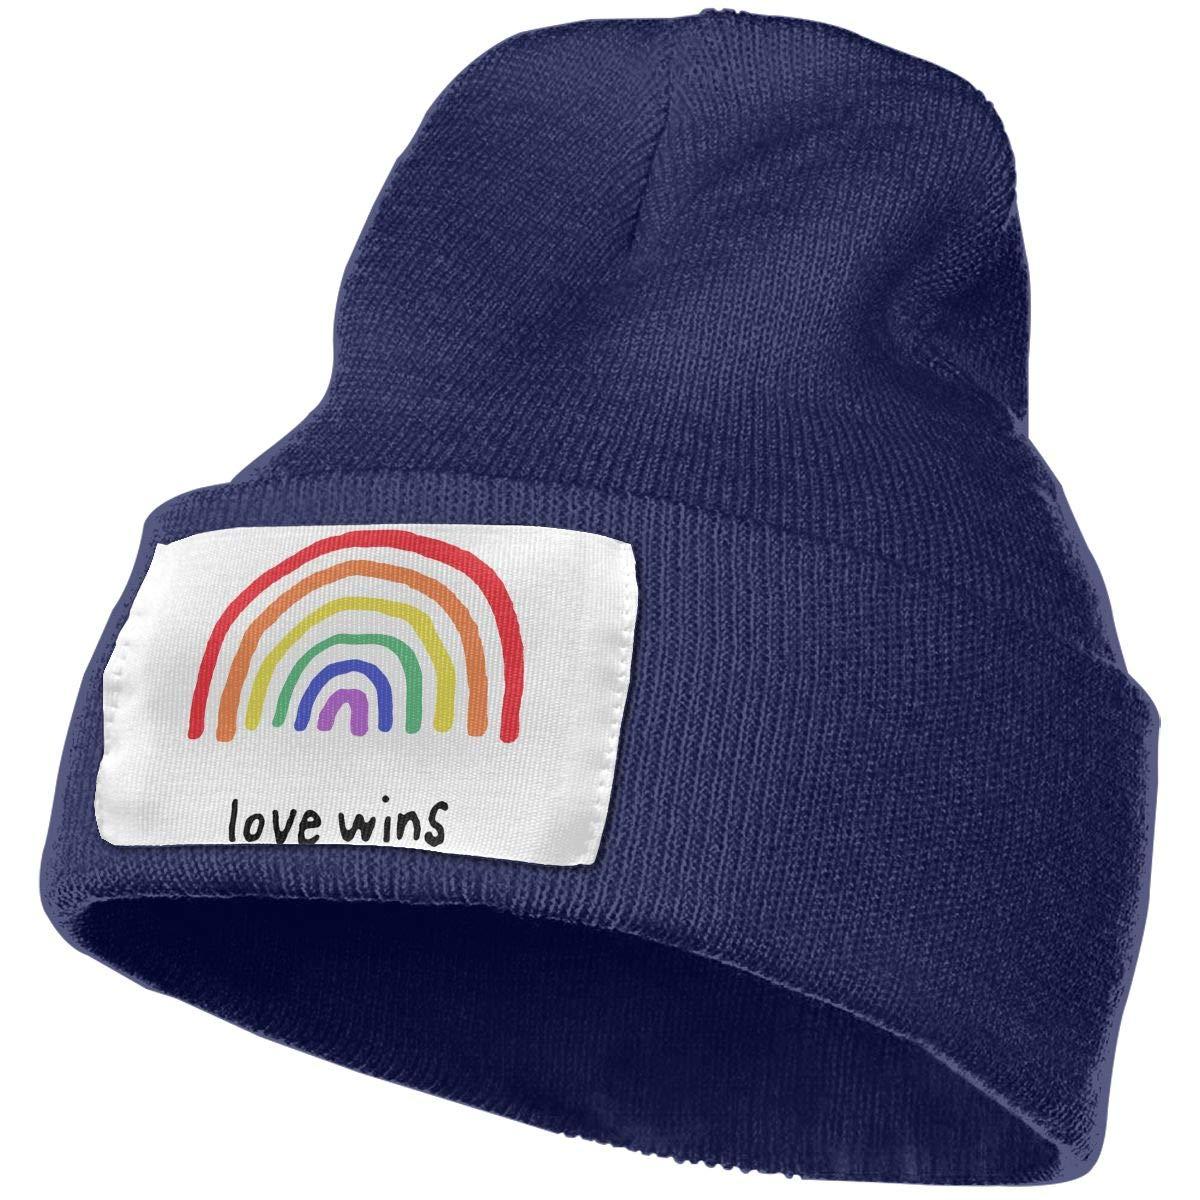 Love Wins Rainbow Beanie Skull Cap Slouchy Knit Beanie Hats Plain Winter Hats for Men Women Daily